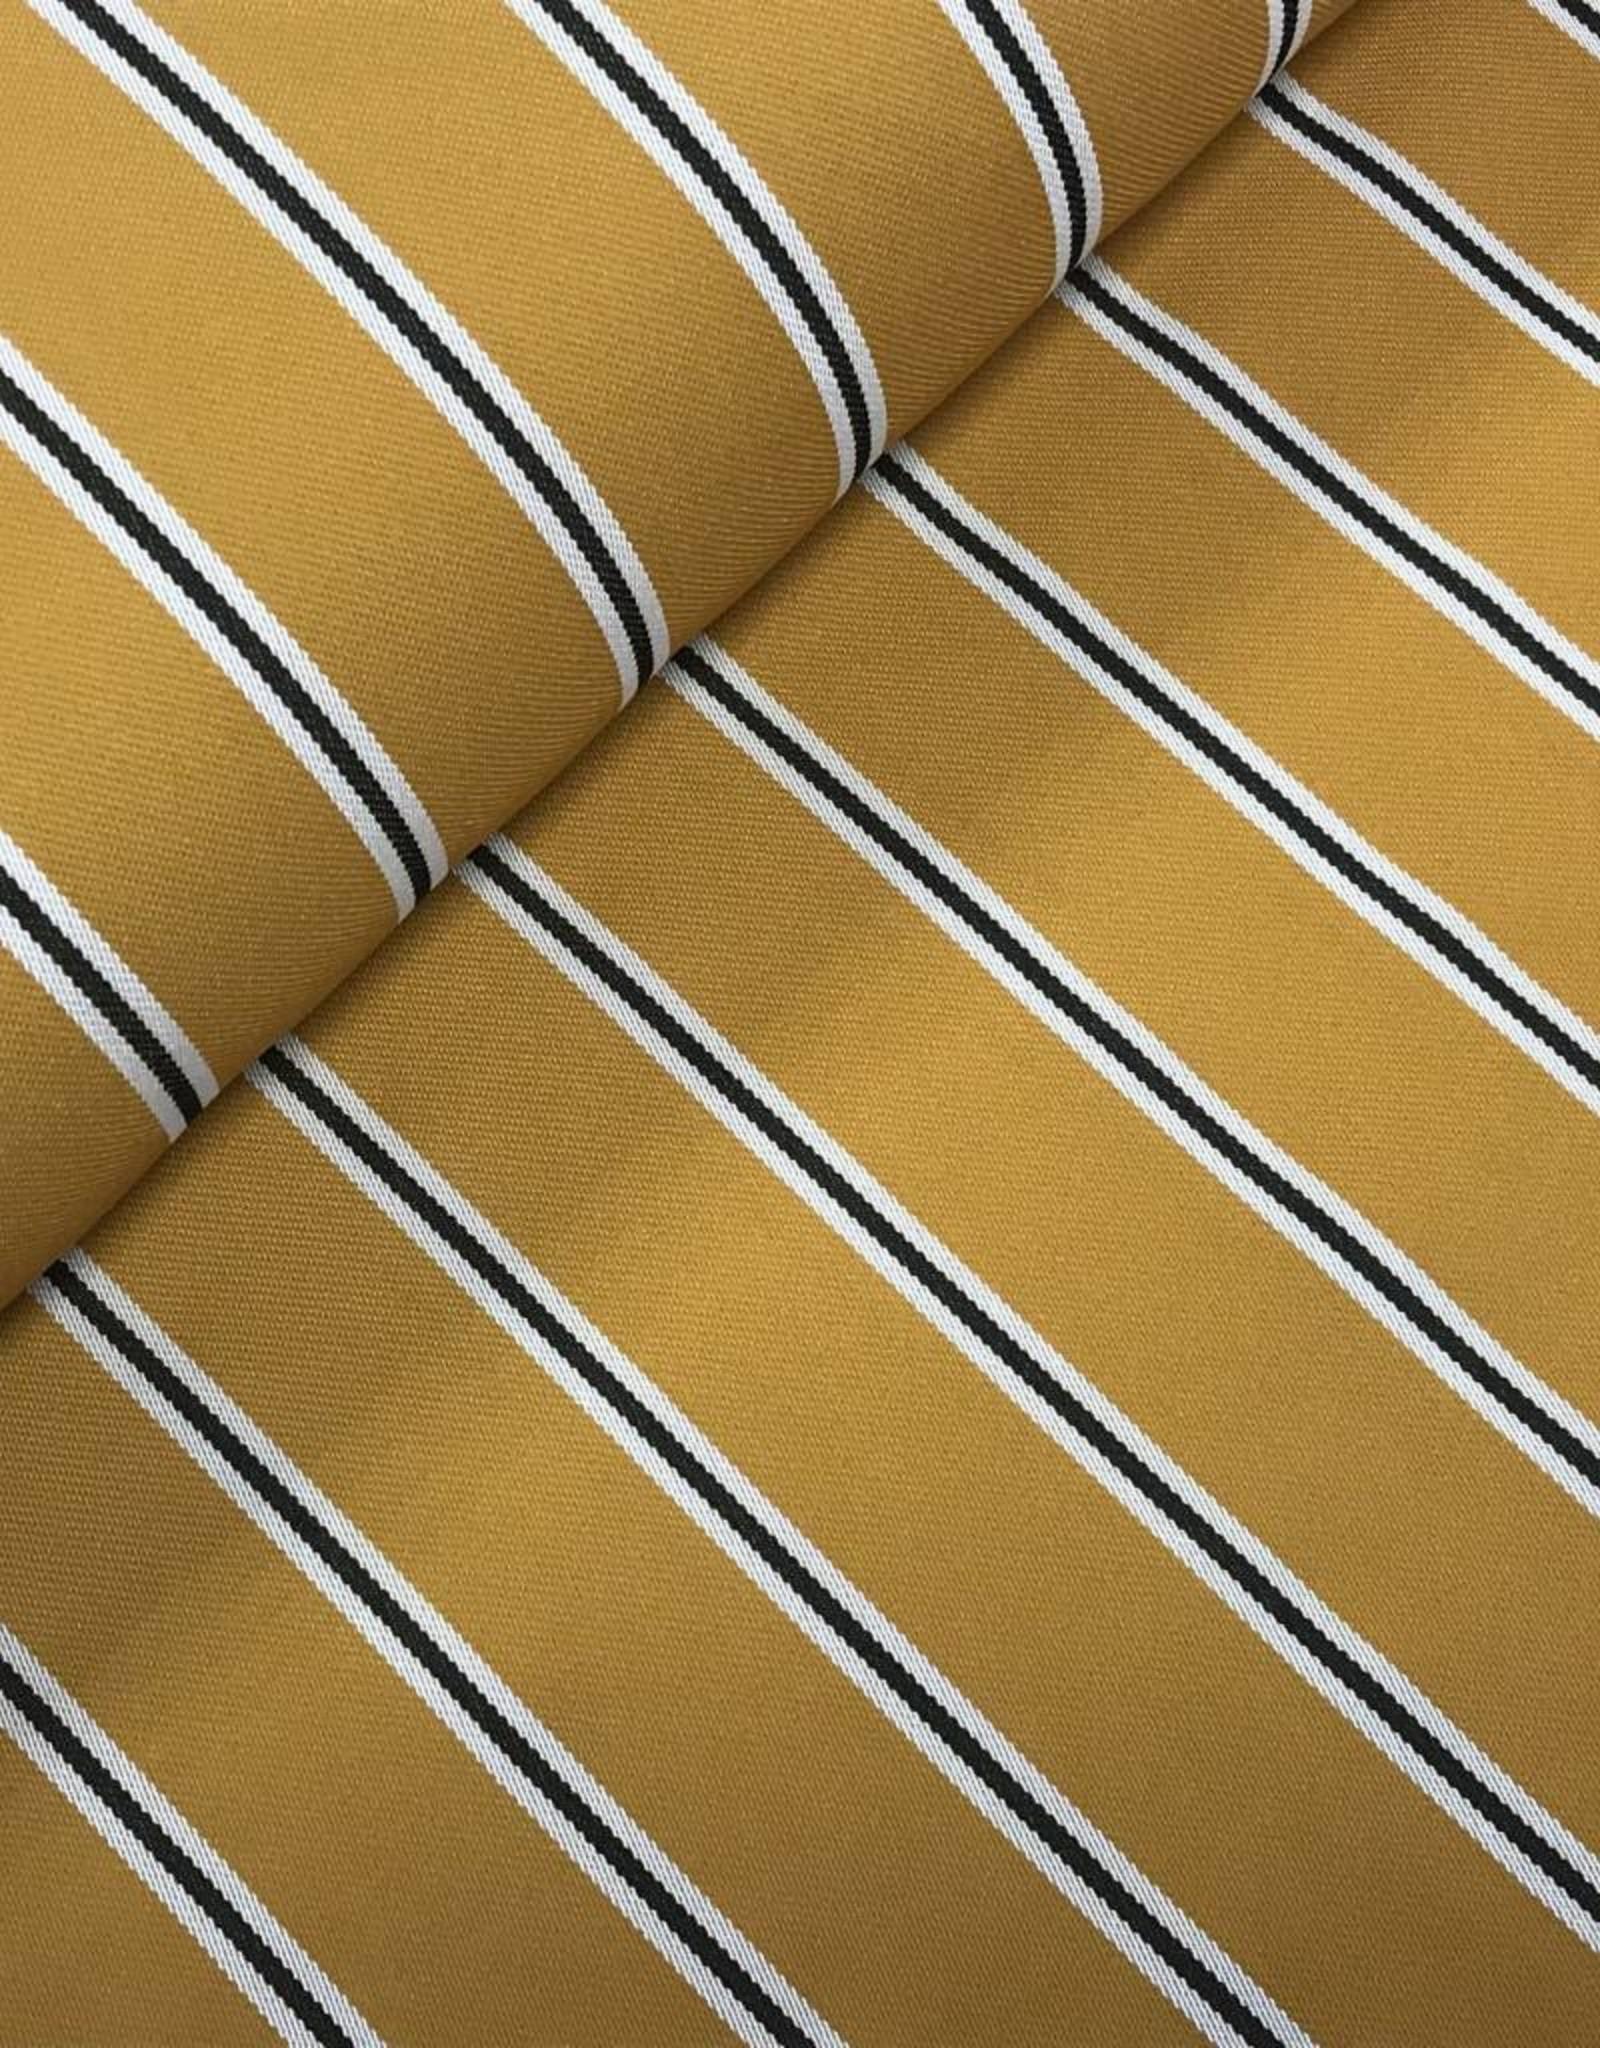 COUPON Gaucho stripes oker 105*140cm